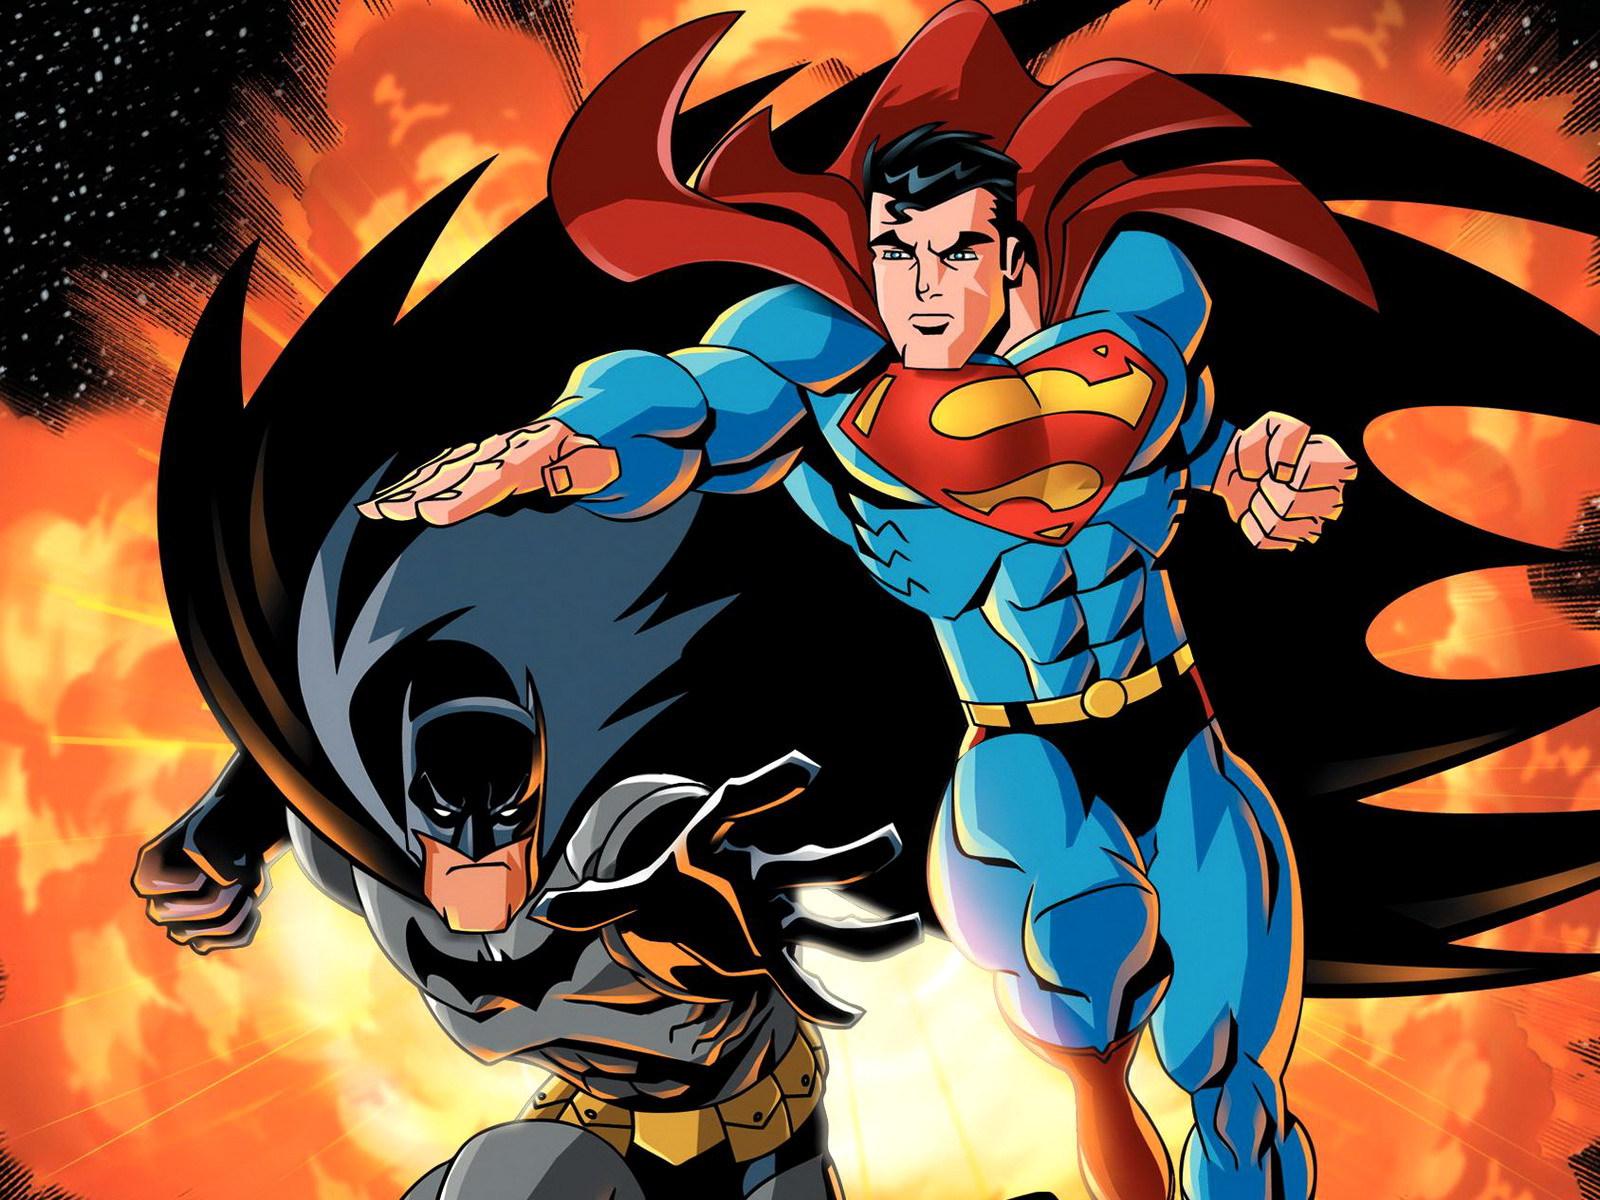 batman and superman cartoon wallpaper - photo #1